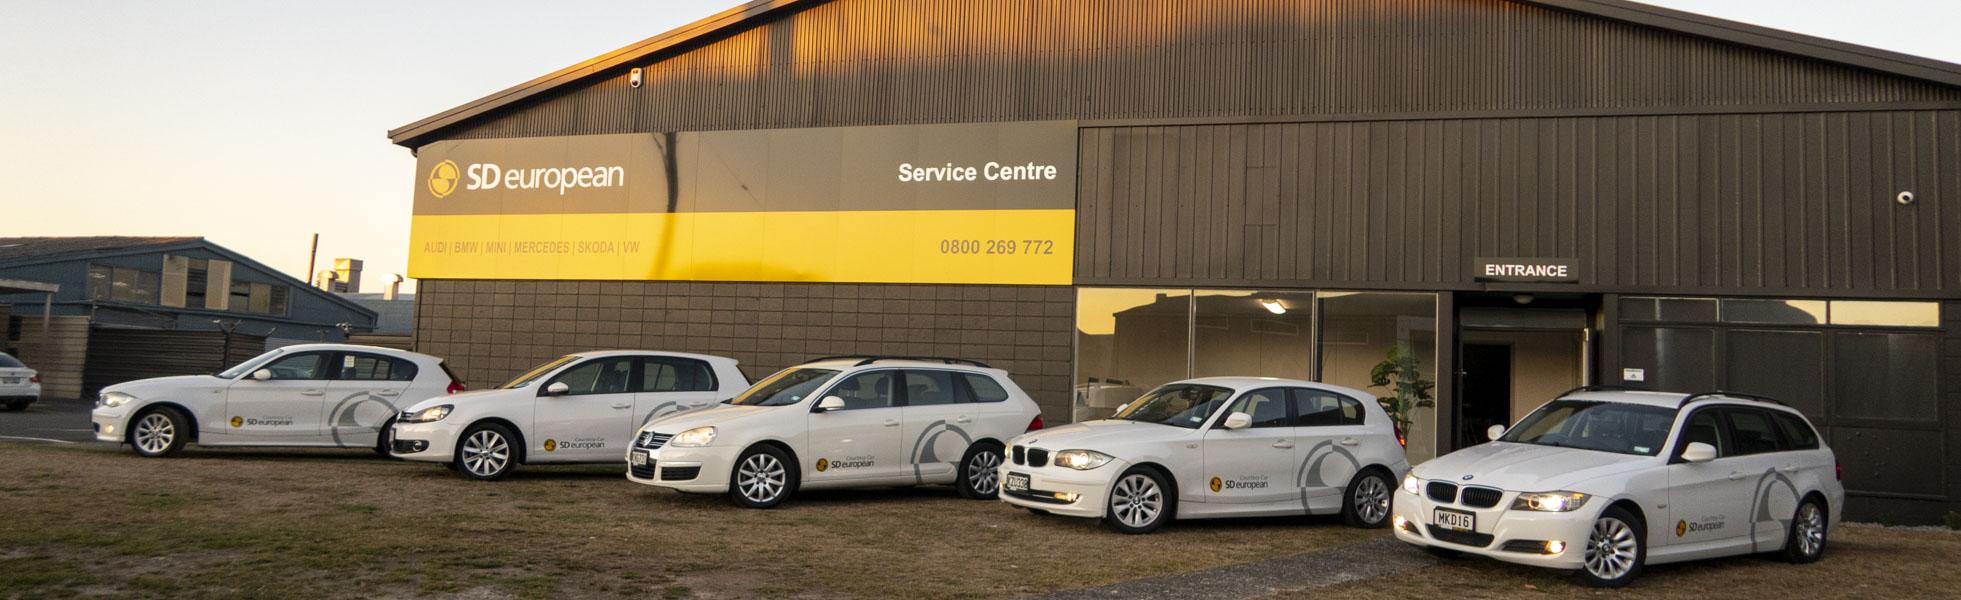 service centre out front